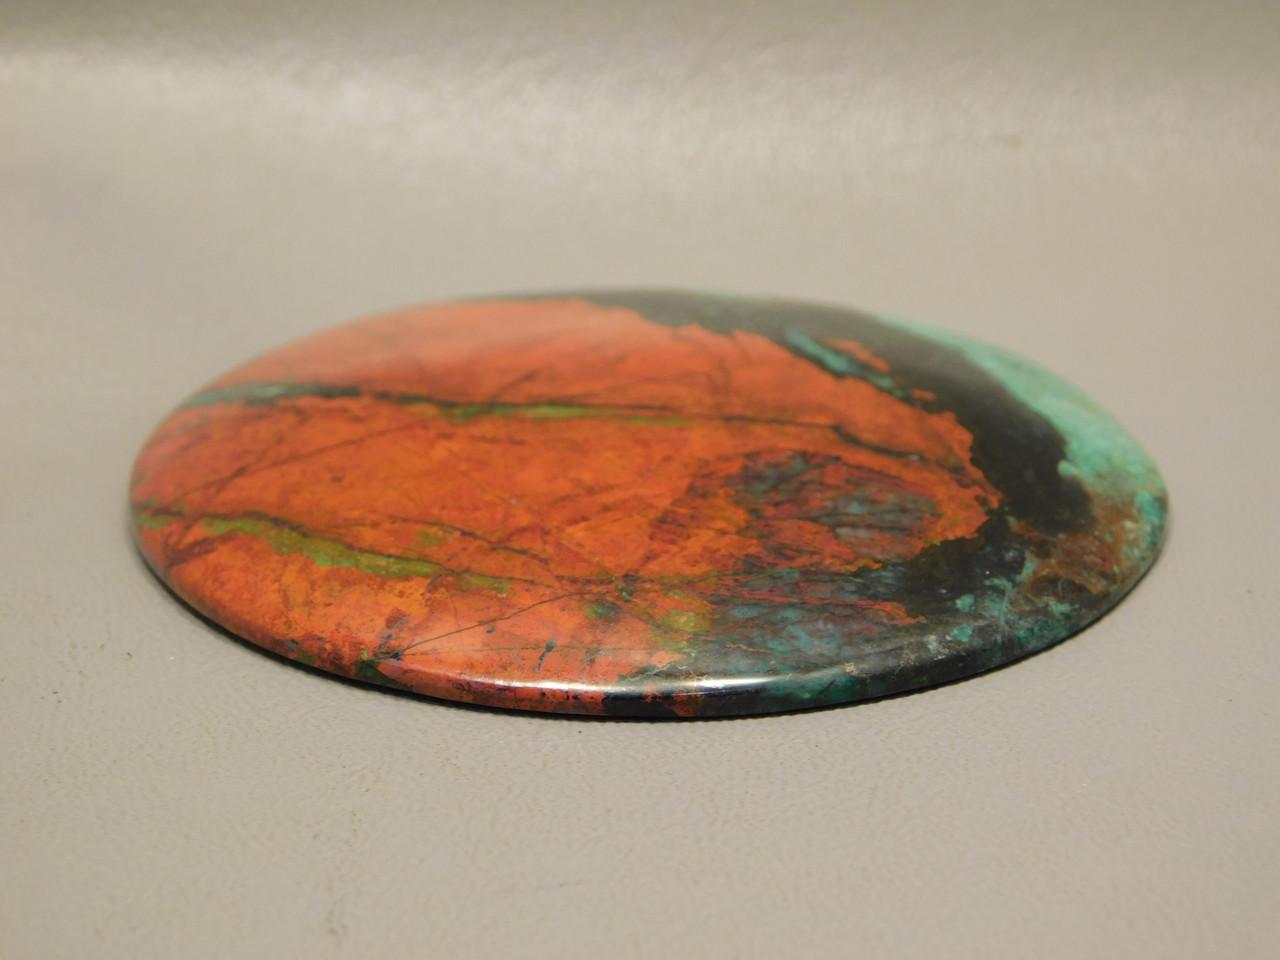 Sonora Sunset Chrysocolla Cuprite 3 inch Large Round Cabochon #xl4